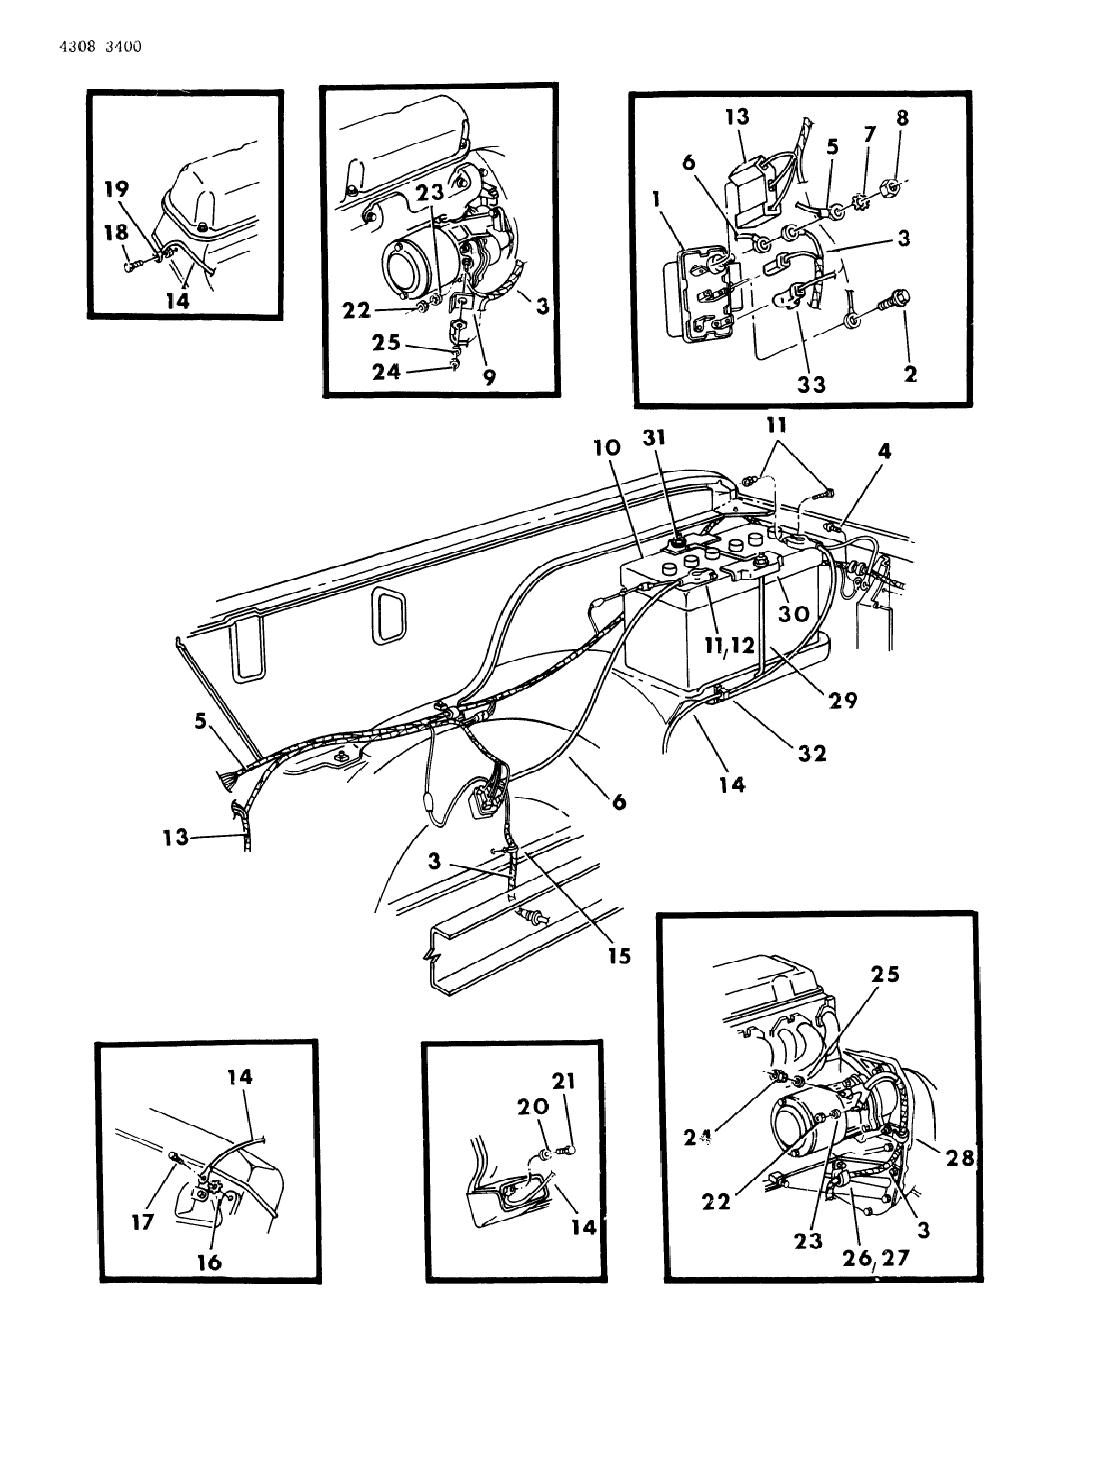 Wiring Diagram Database: Mopar Starter Relay Wiring Diagram